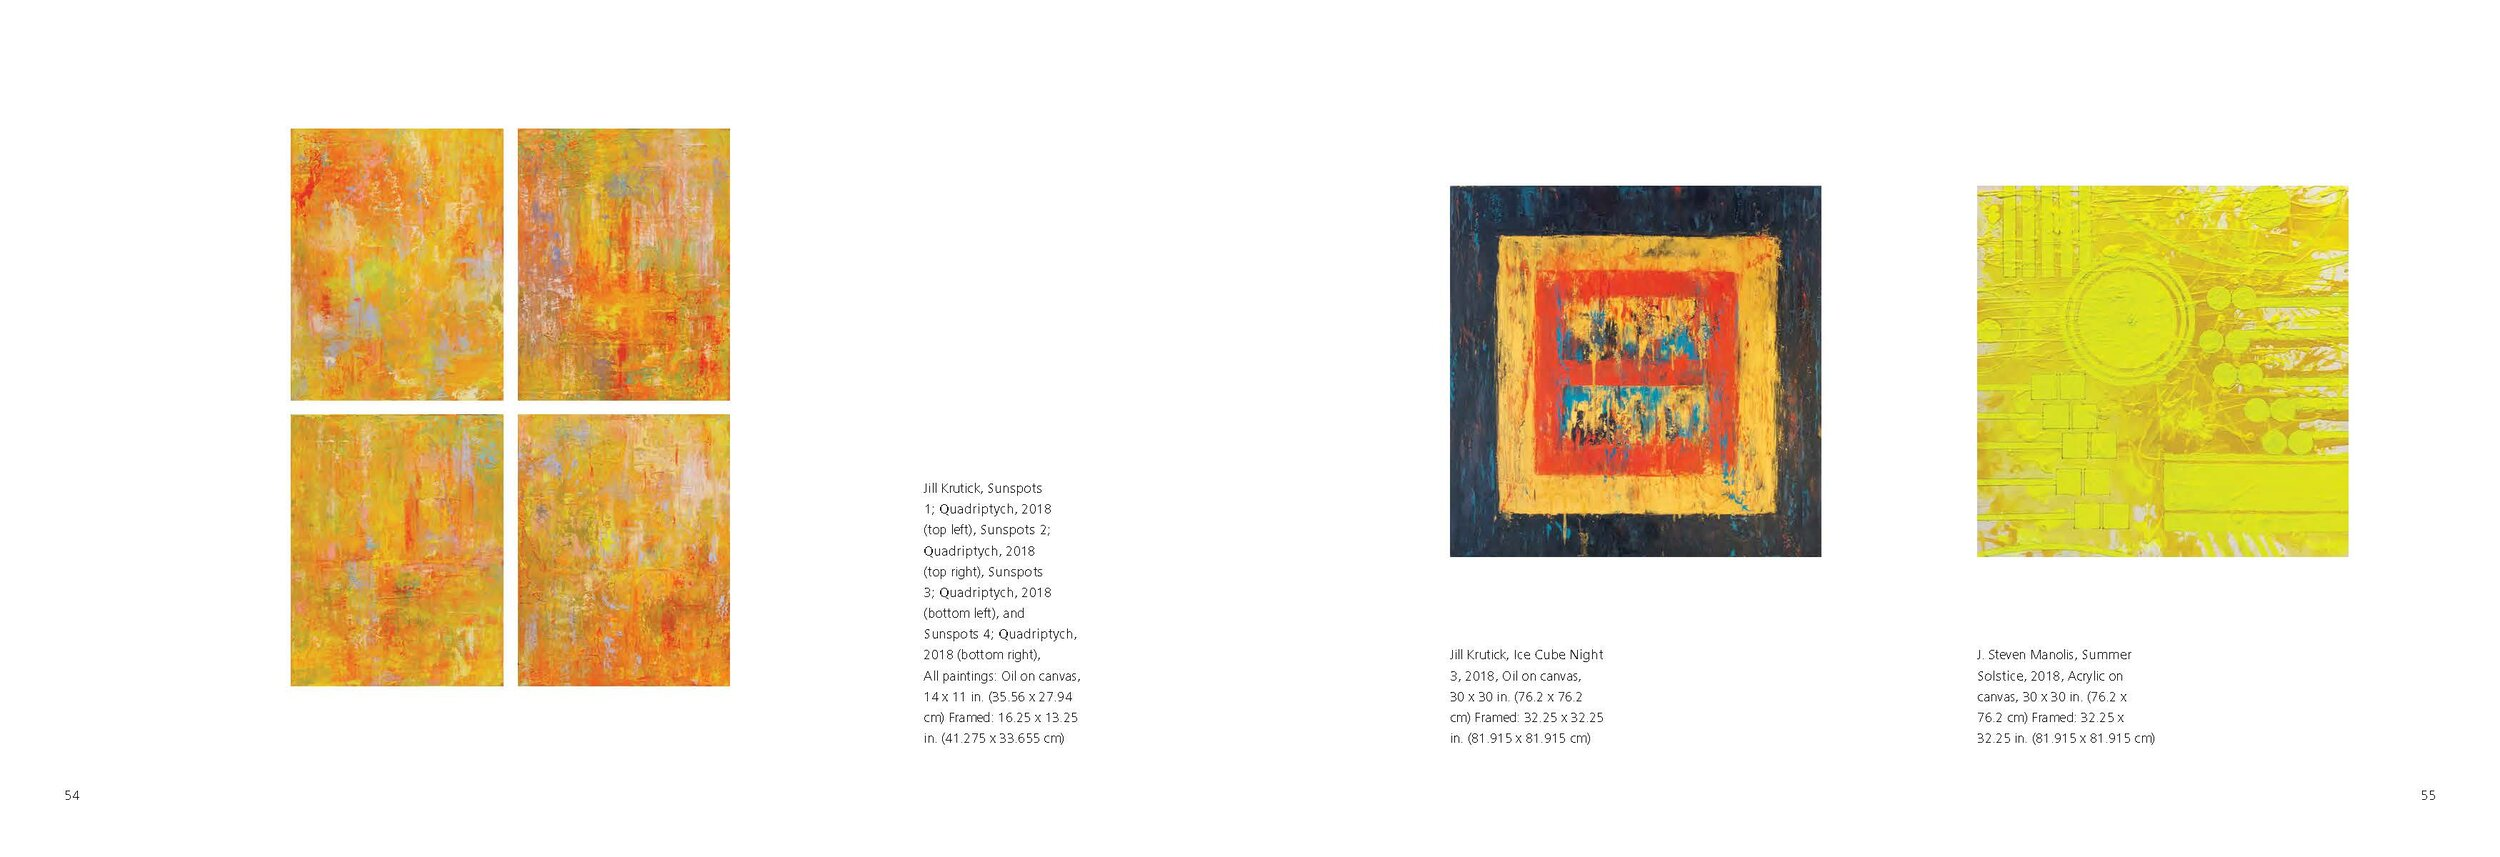 09-05-2018-Manolis-NationalArtsClub-FINAL web_Page_29.jpg